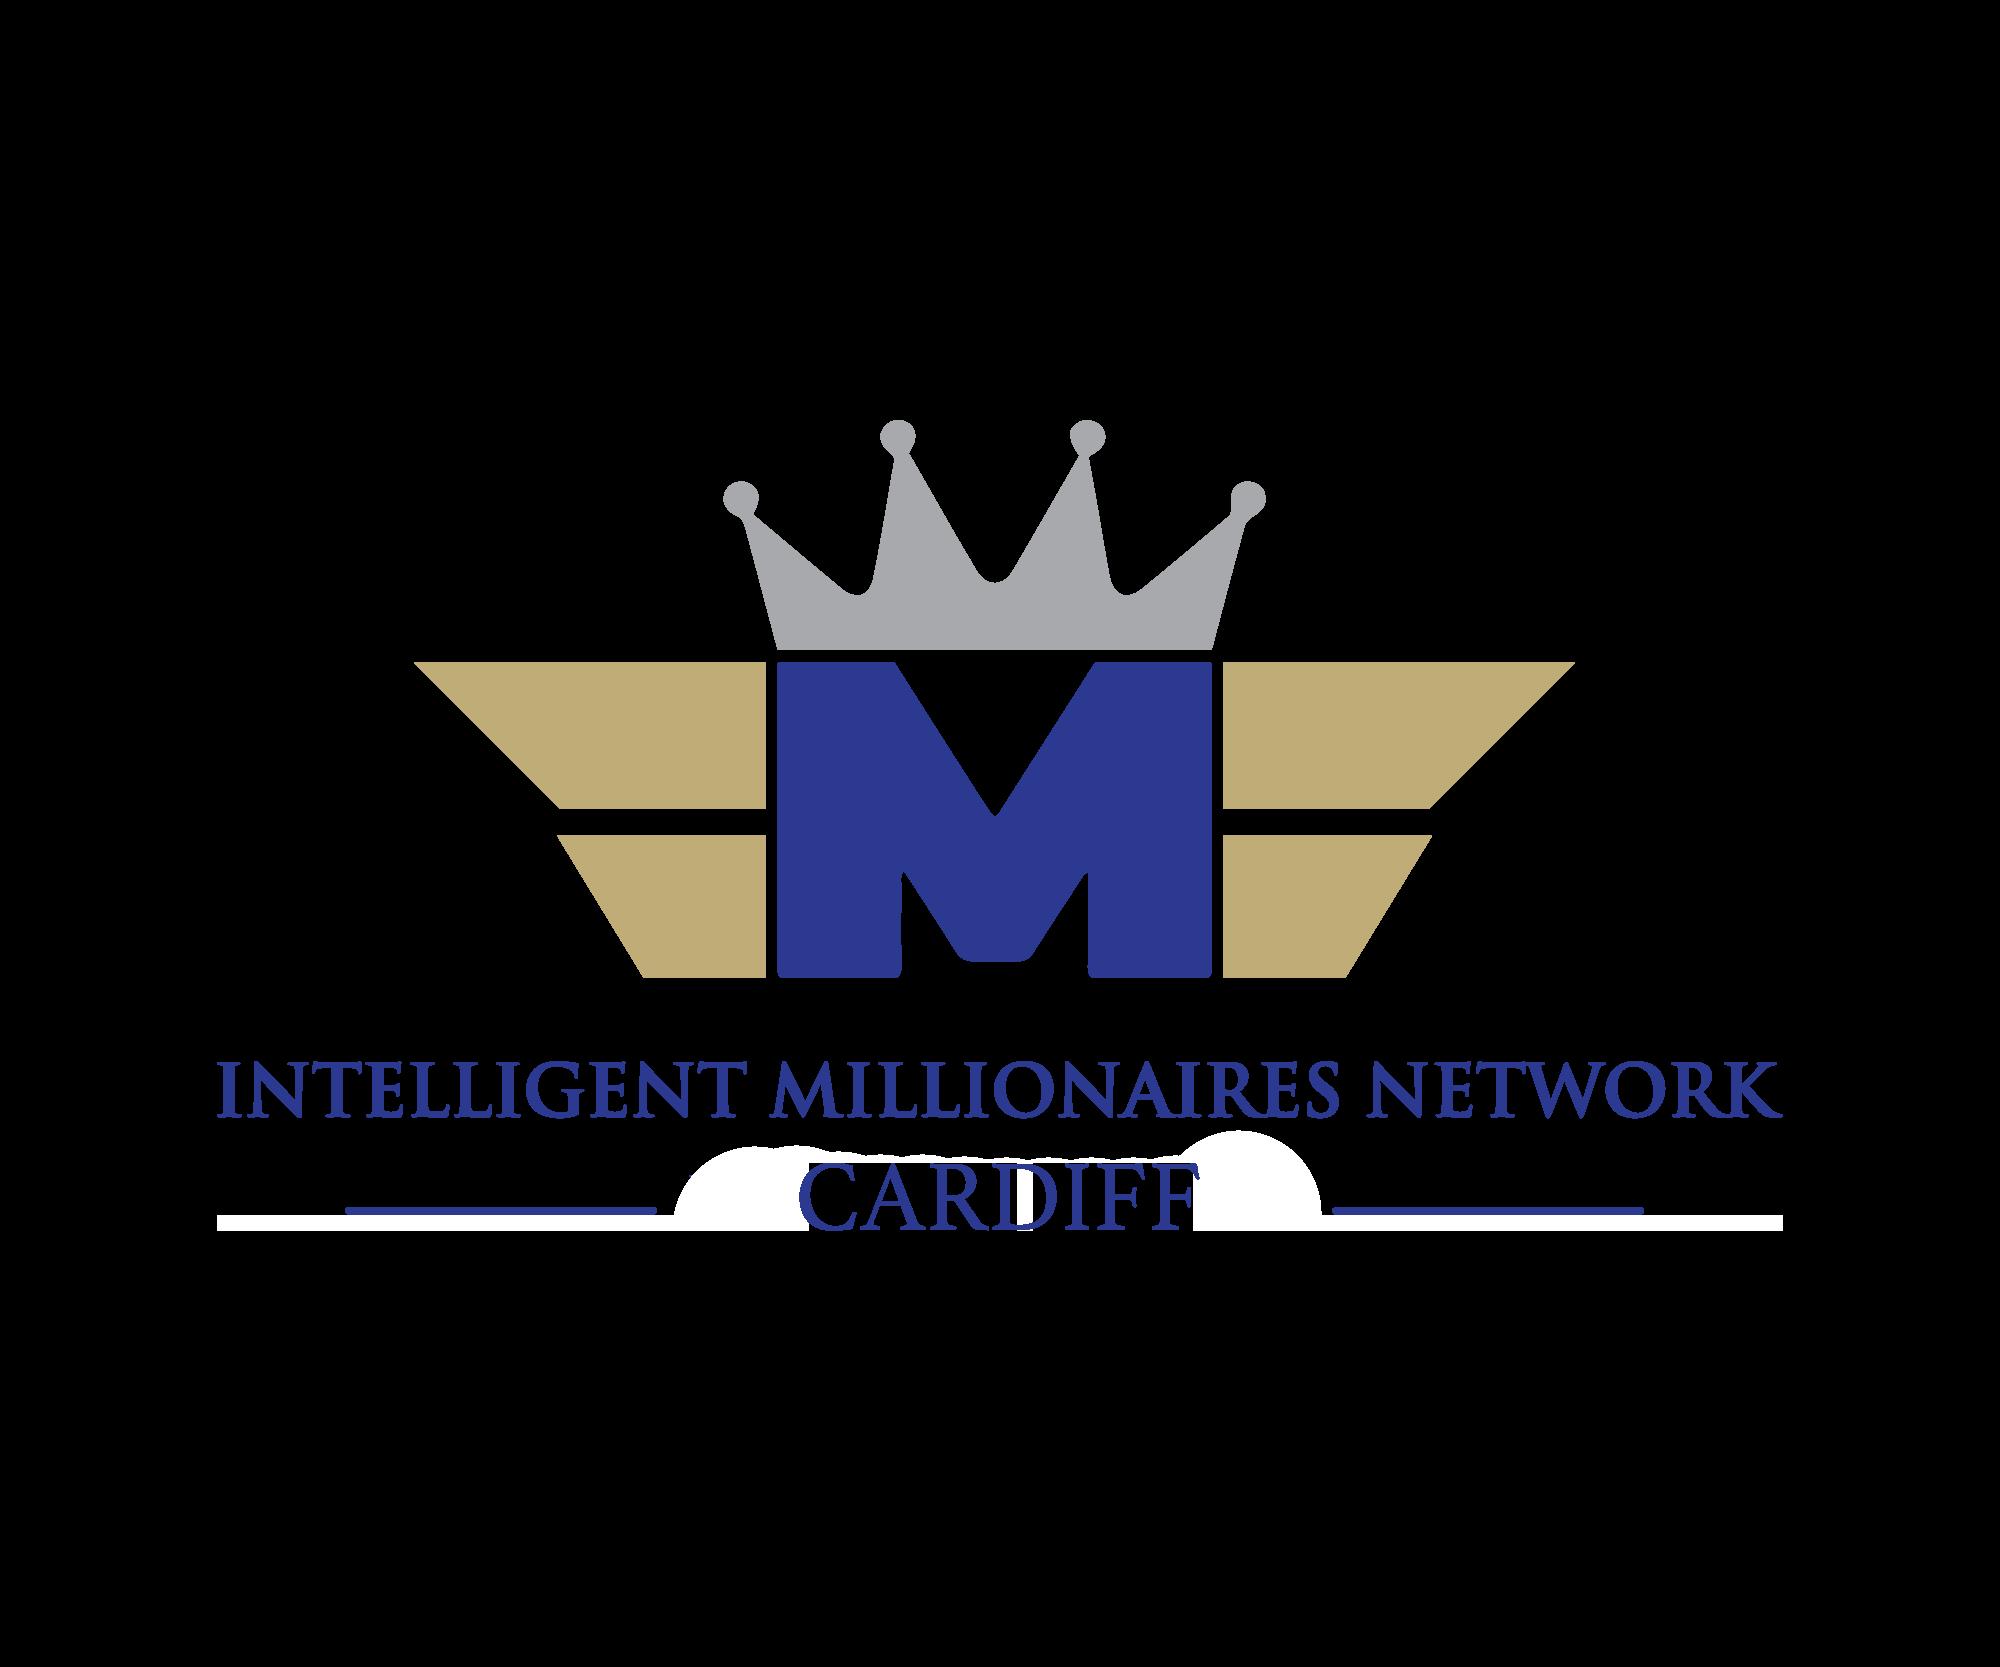 intelligent-millionare cardiff.png